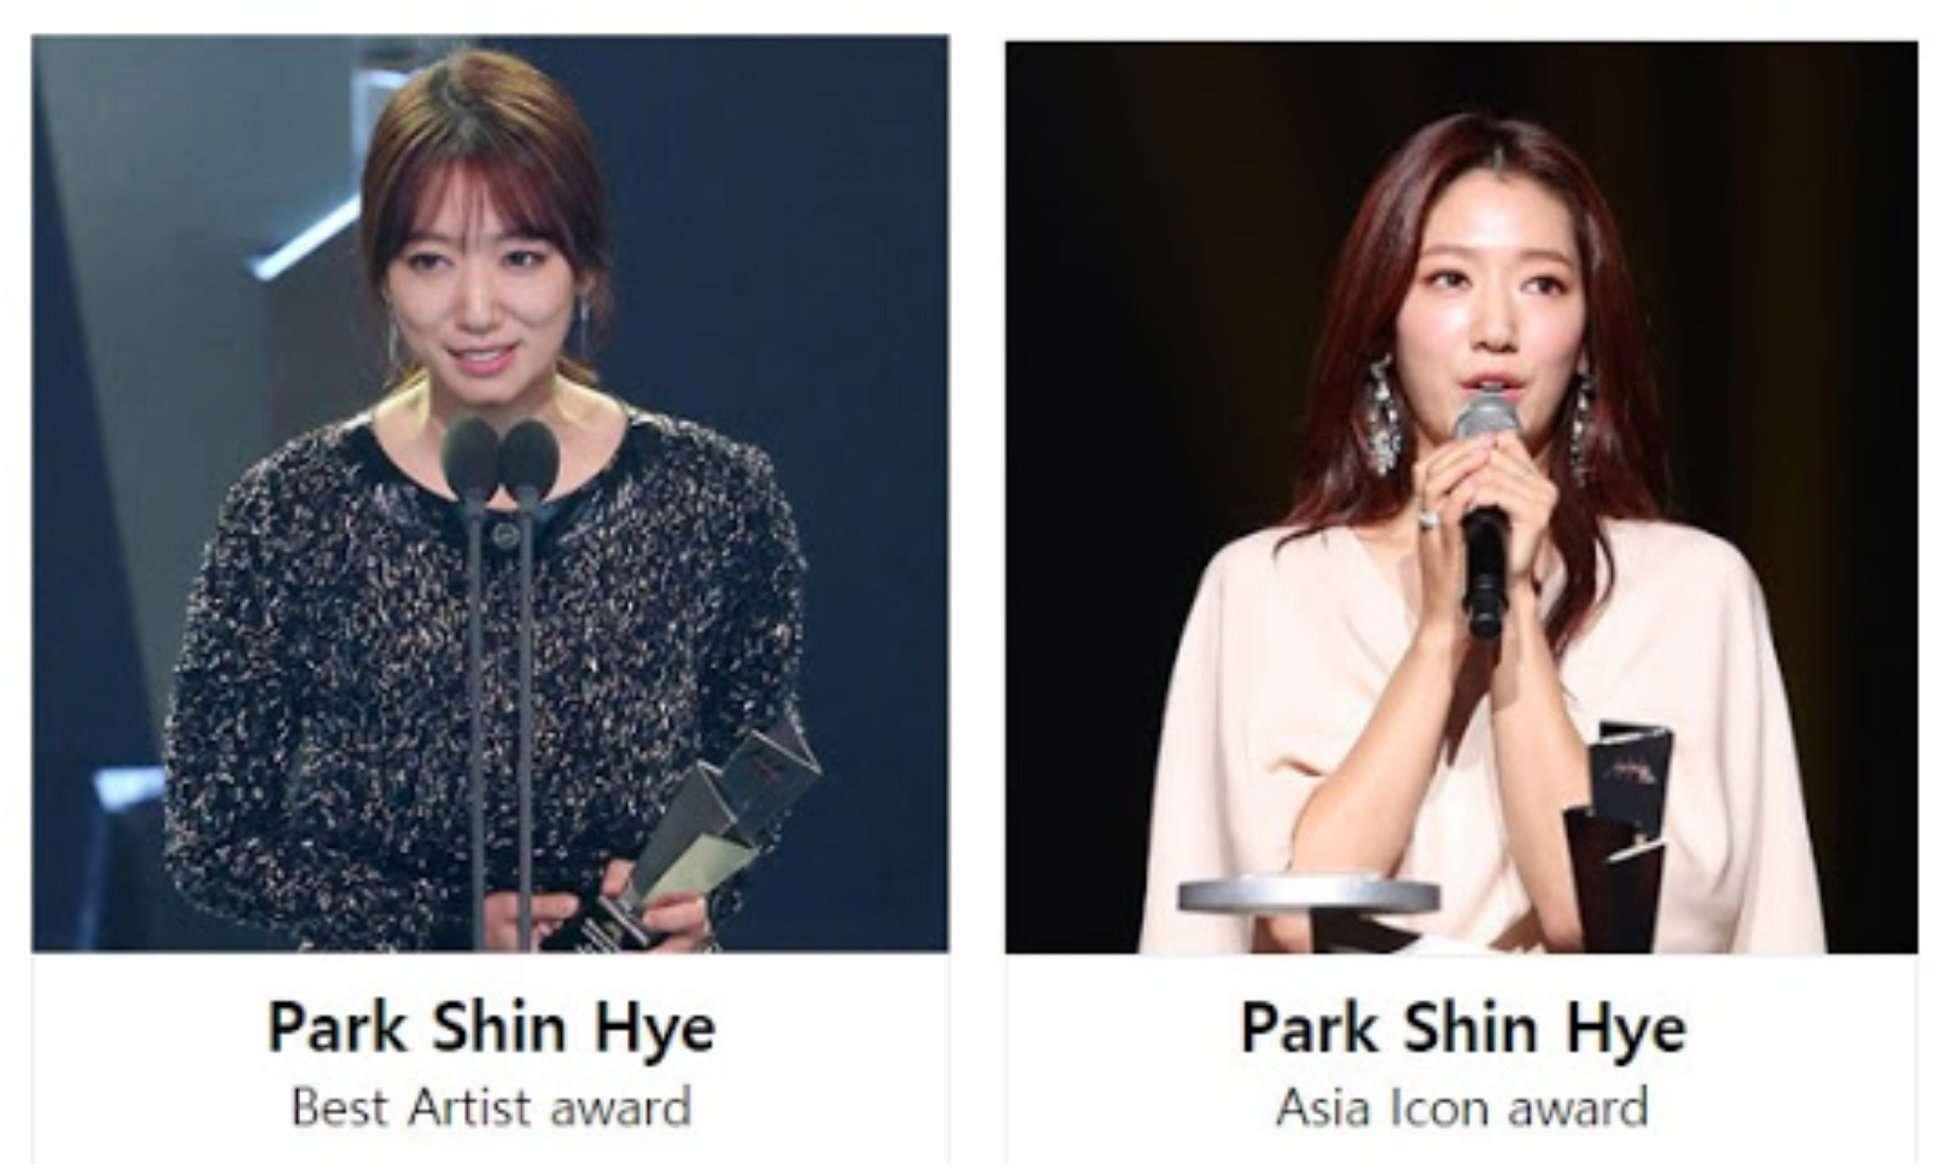 Ë°•ì‹í˜œ ͎˜ì´ìŠ¤ë¶ Blog Vote Park Shin Hye On 2020 Asia Artist Awards